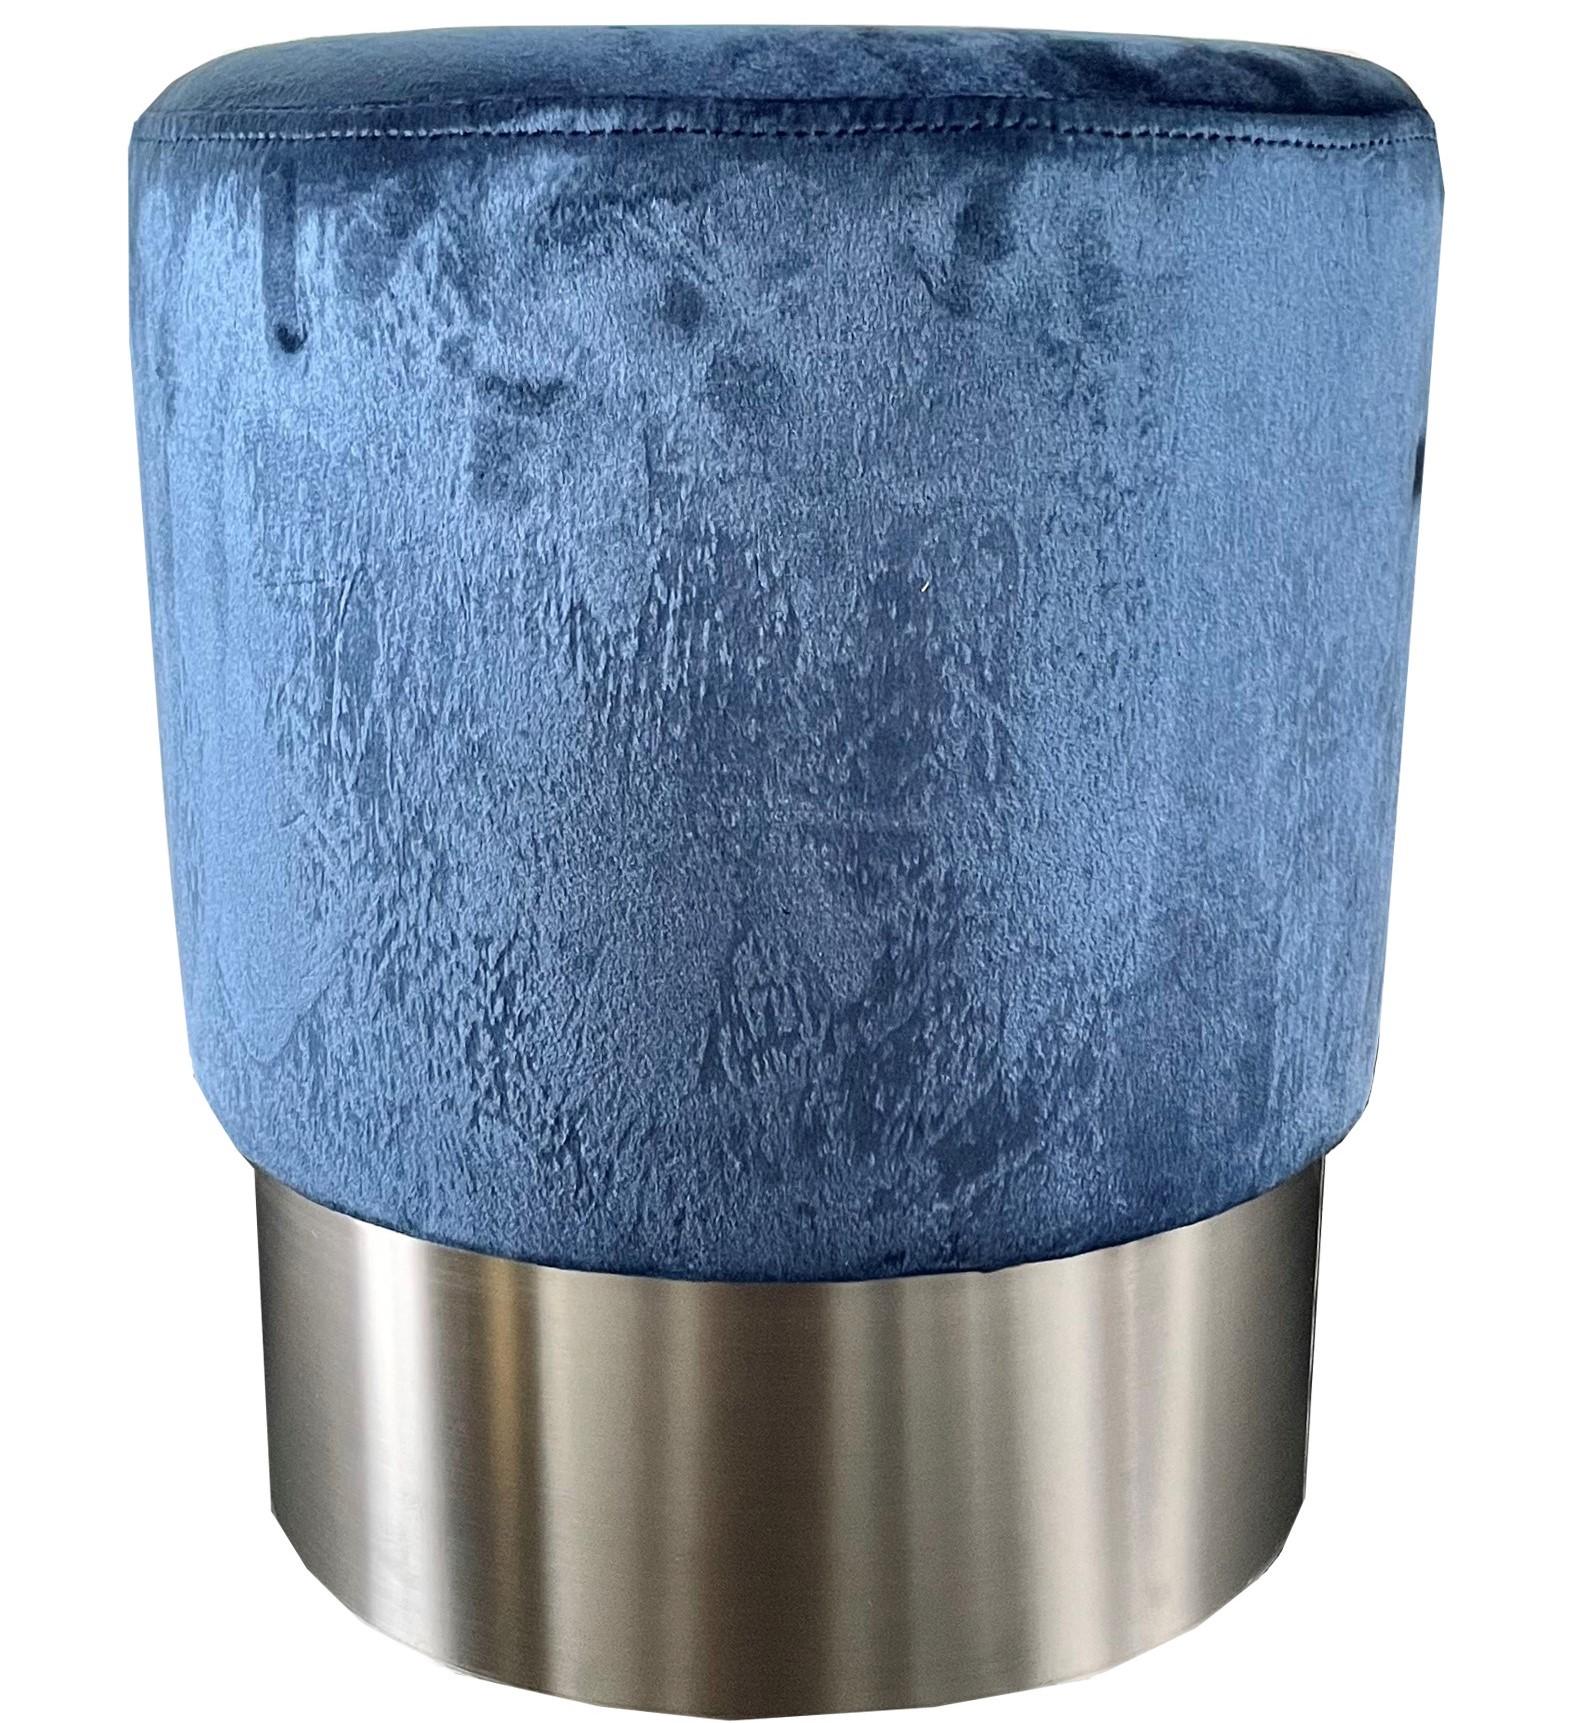 MARIAN - Poef blauw 36x36x44 cm